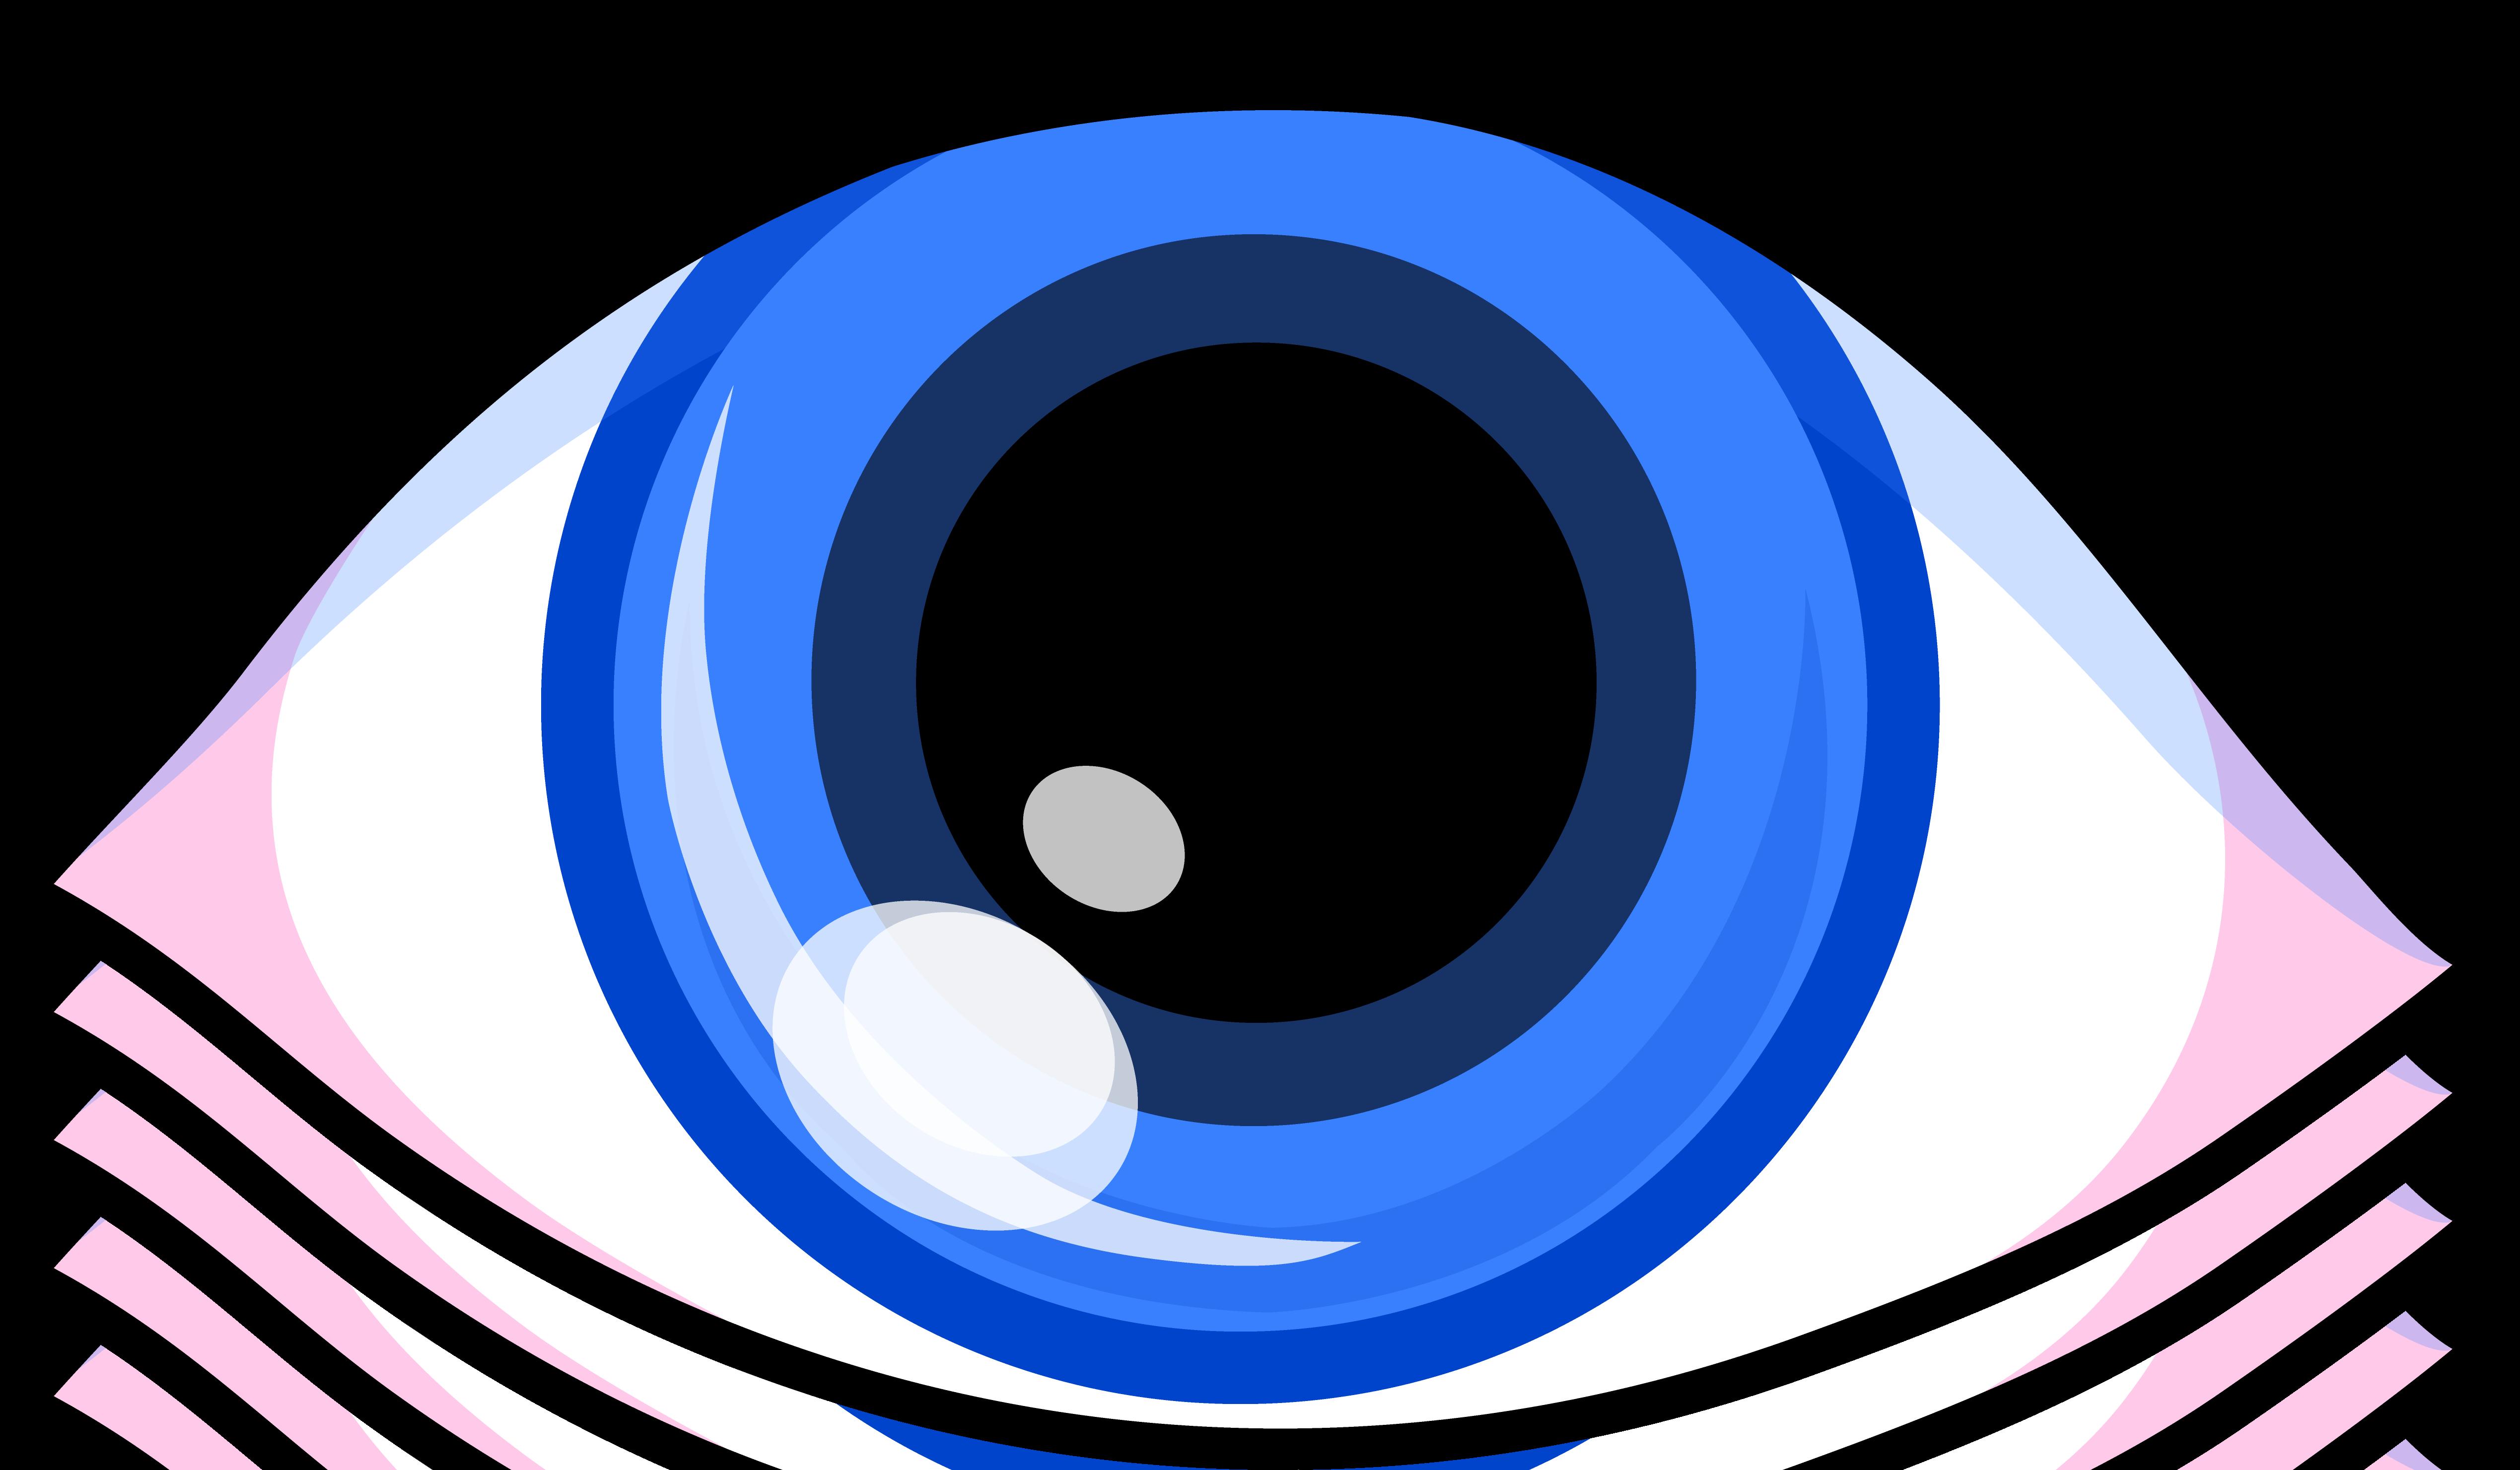 Simple blue eye.